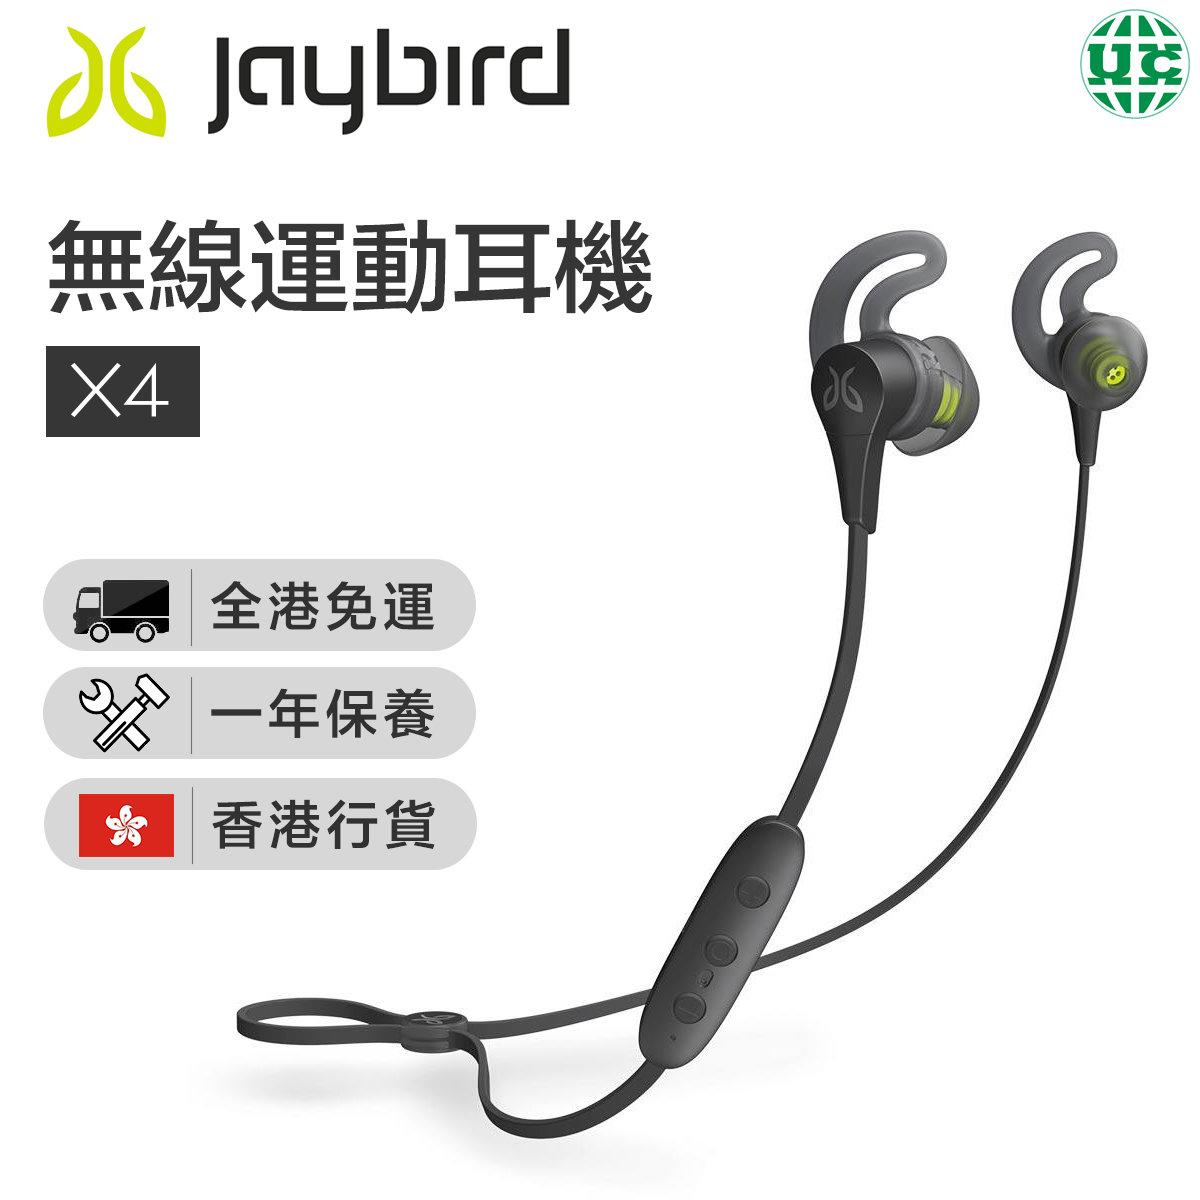 X4 Wireless Sports Headphones - Black (Hong Kong licensed)